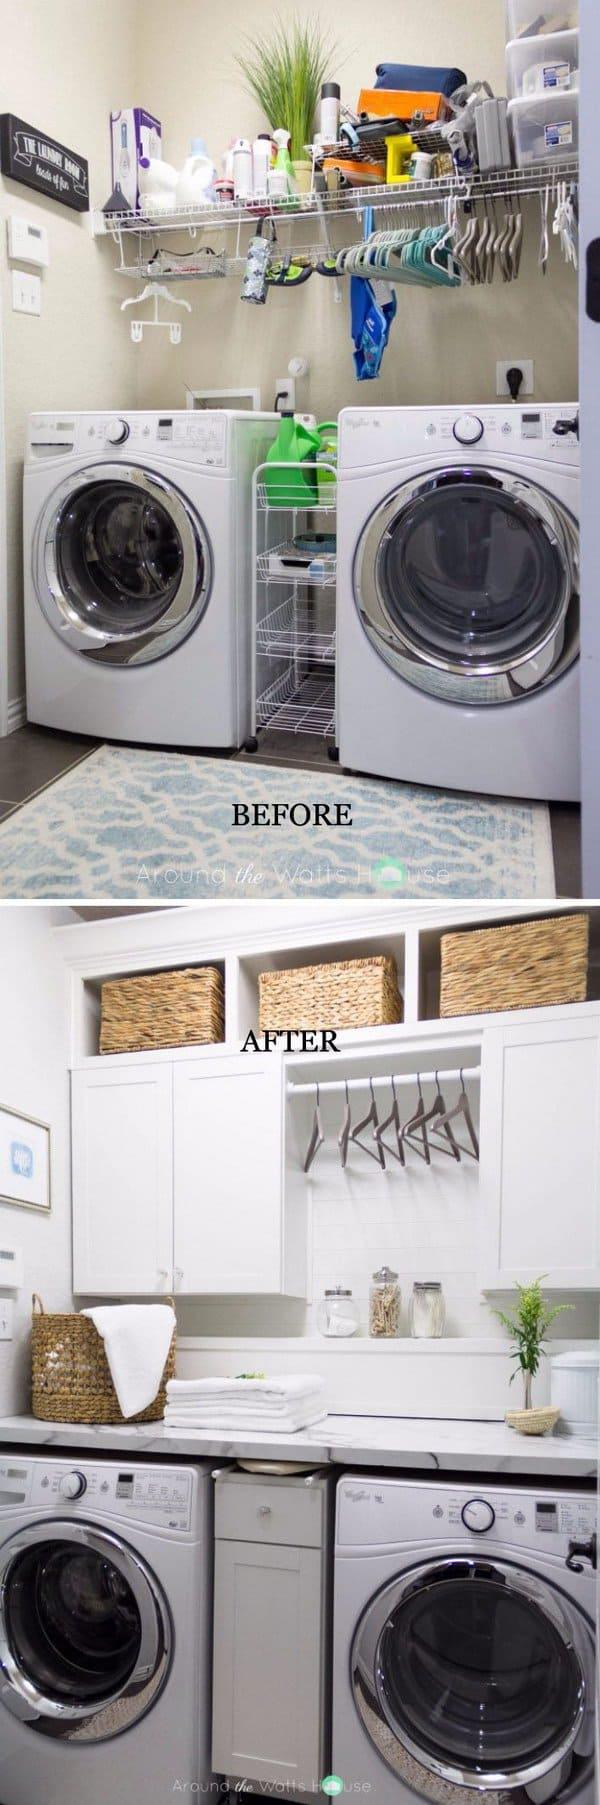 laundryroom17